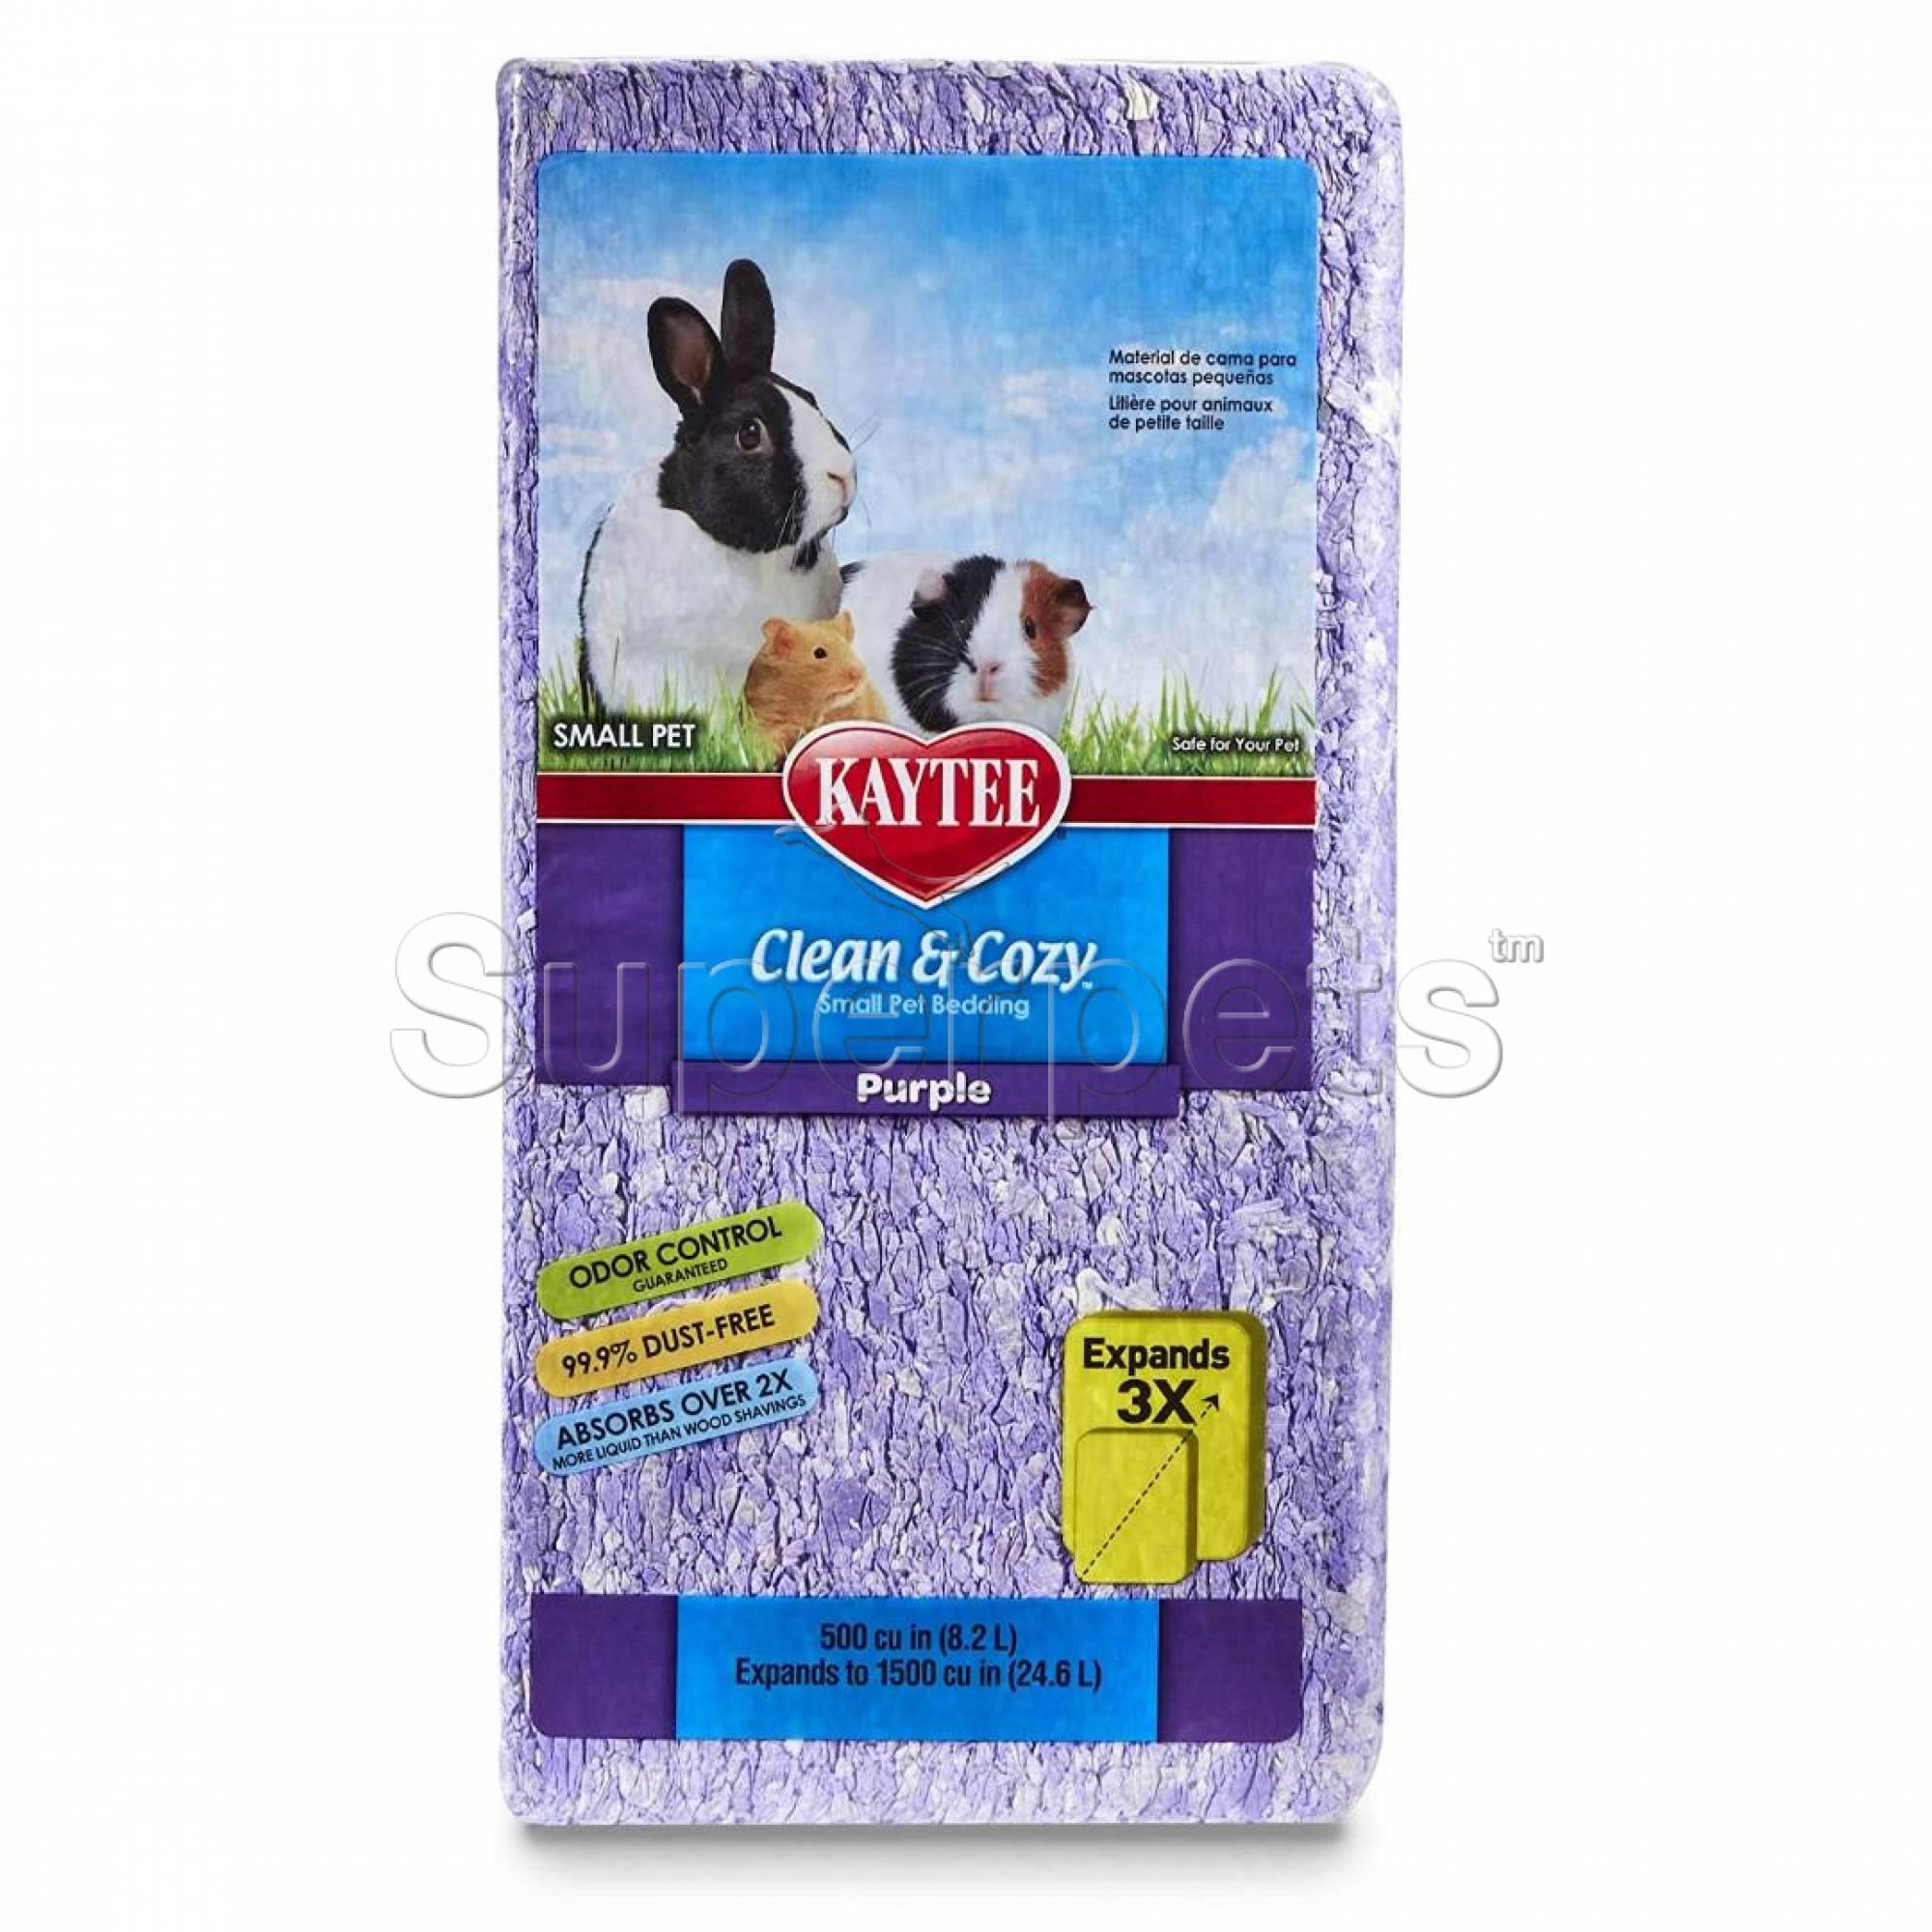 Kaytee Clean & Cozy - Purple Bedding 24.6L (1500cu)